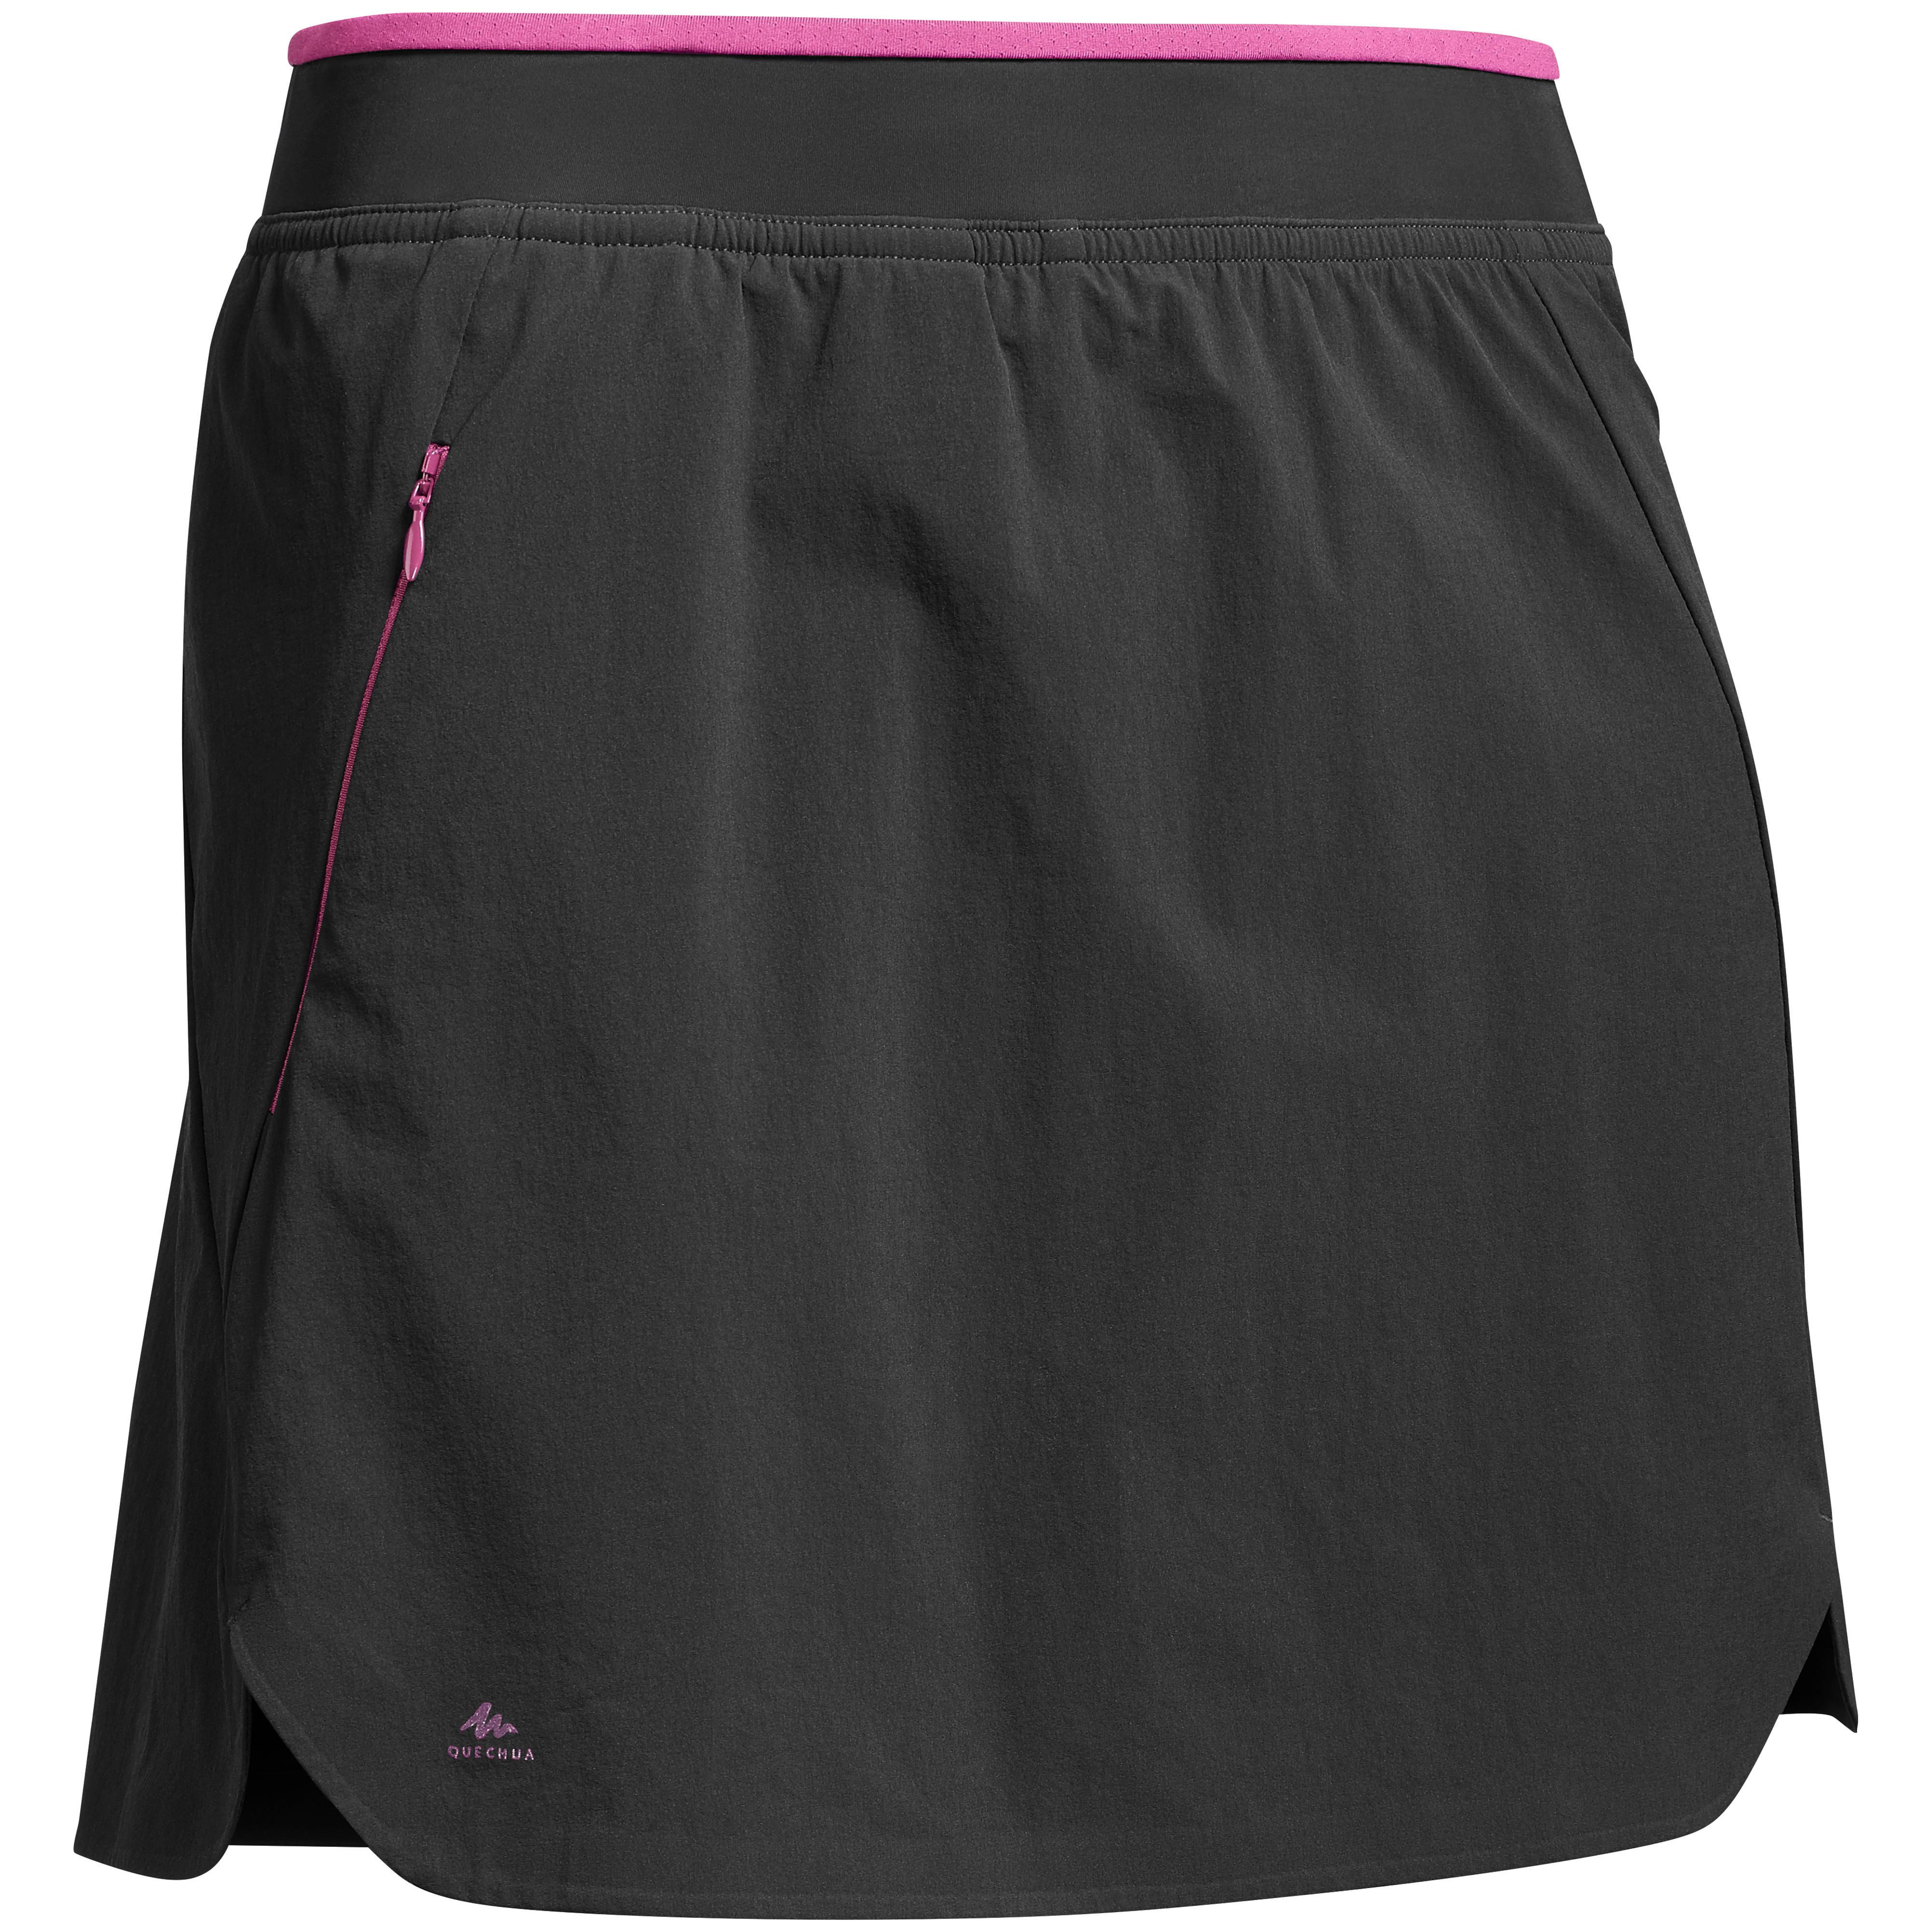 ffab9904fd230 Shorts et jupes de randonnée femme | Decathlon